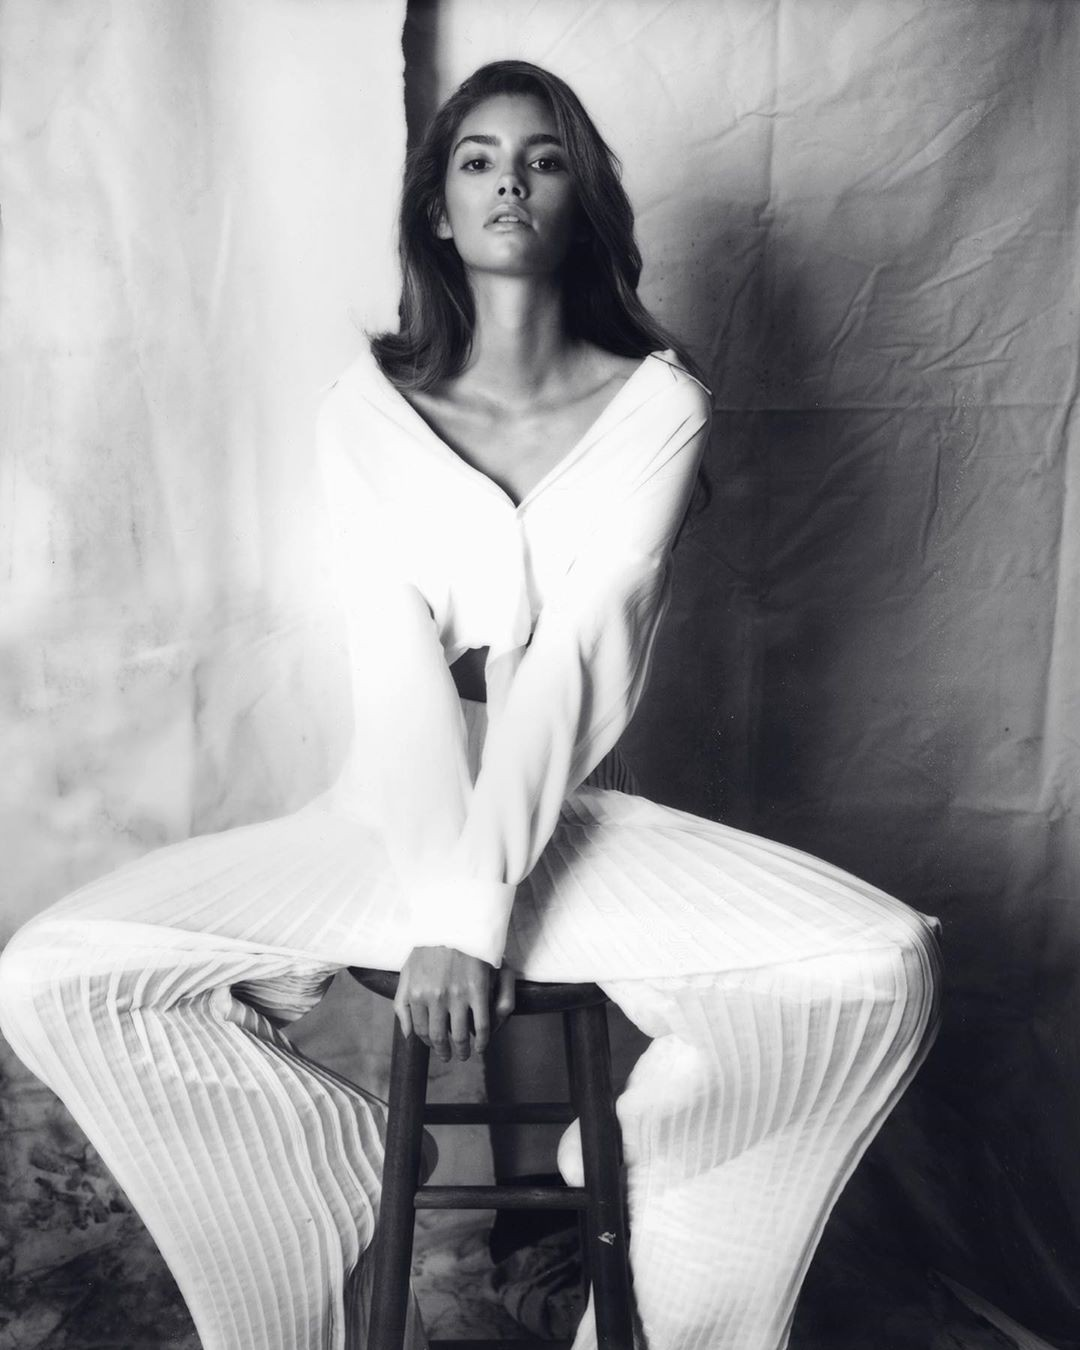 Cindy Mello photoshoot ideas, girls instagram photos, hot legs picture